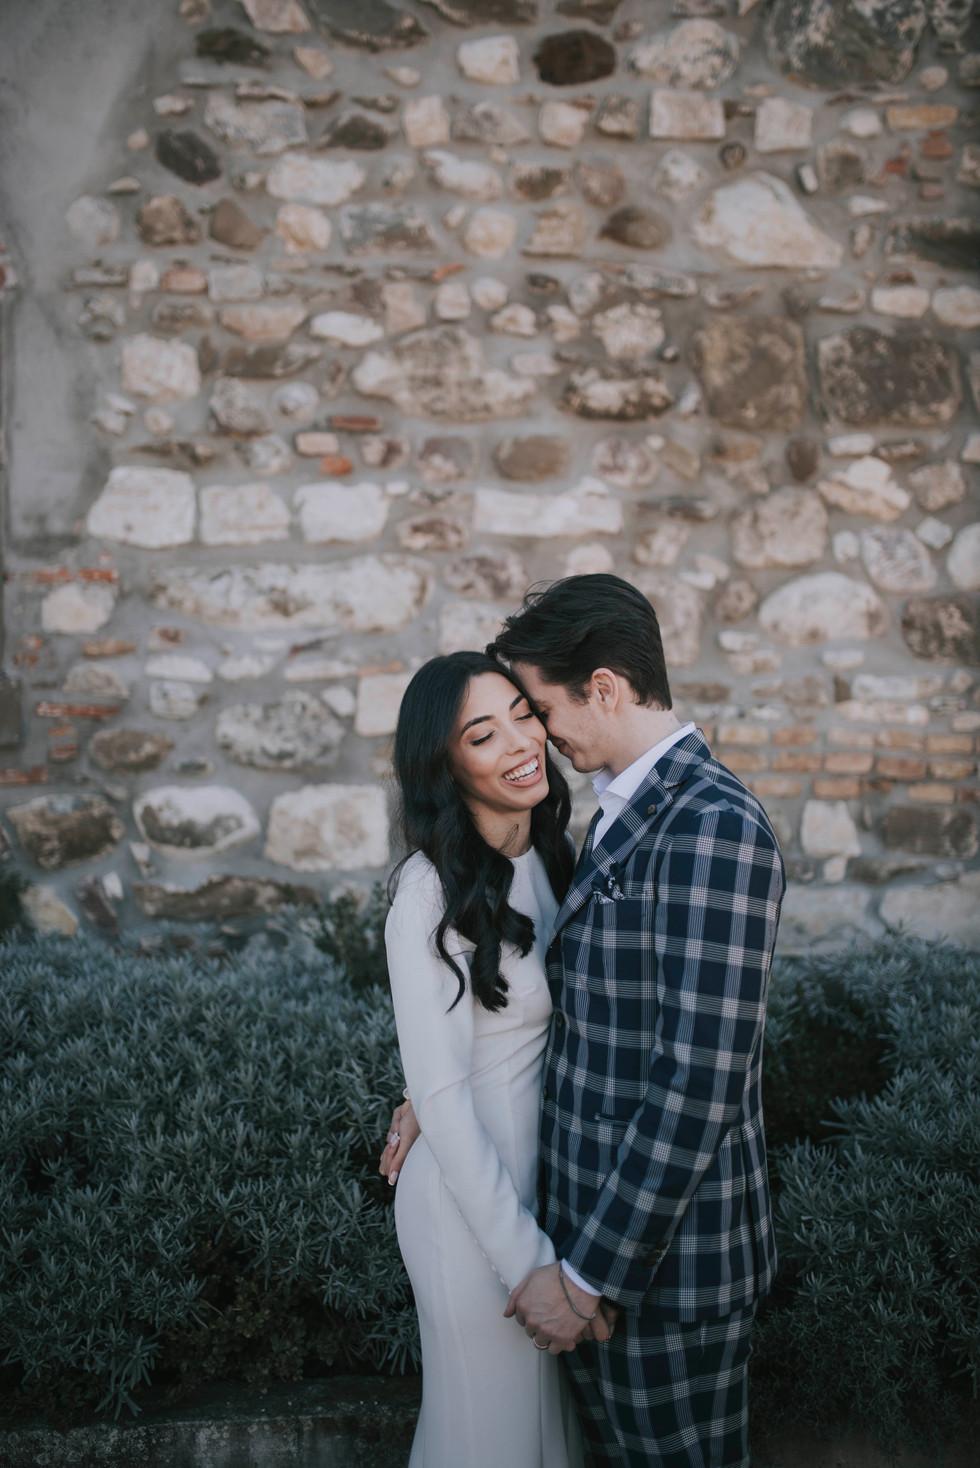 fotografo matrimonio, lisaelisa, wedding